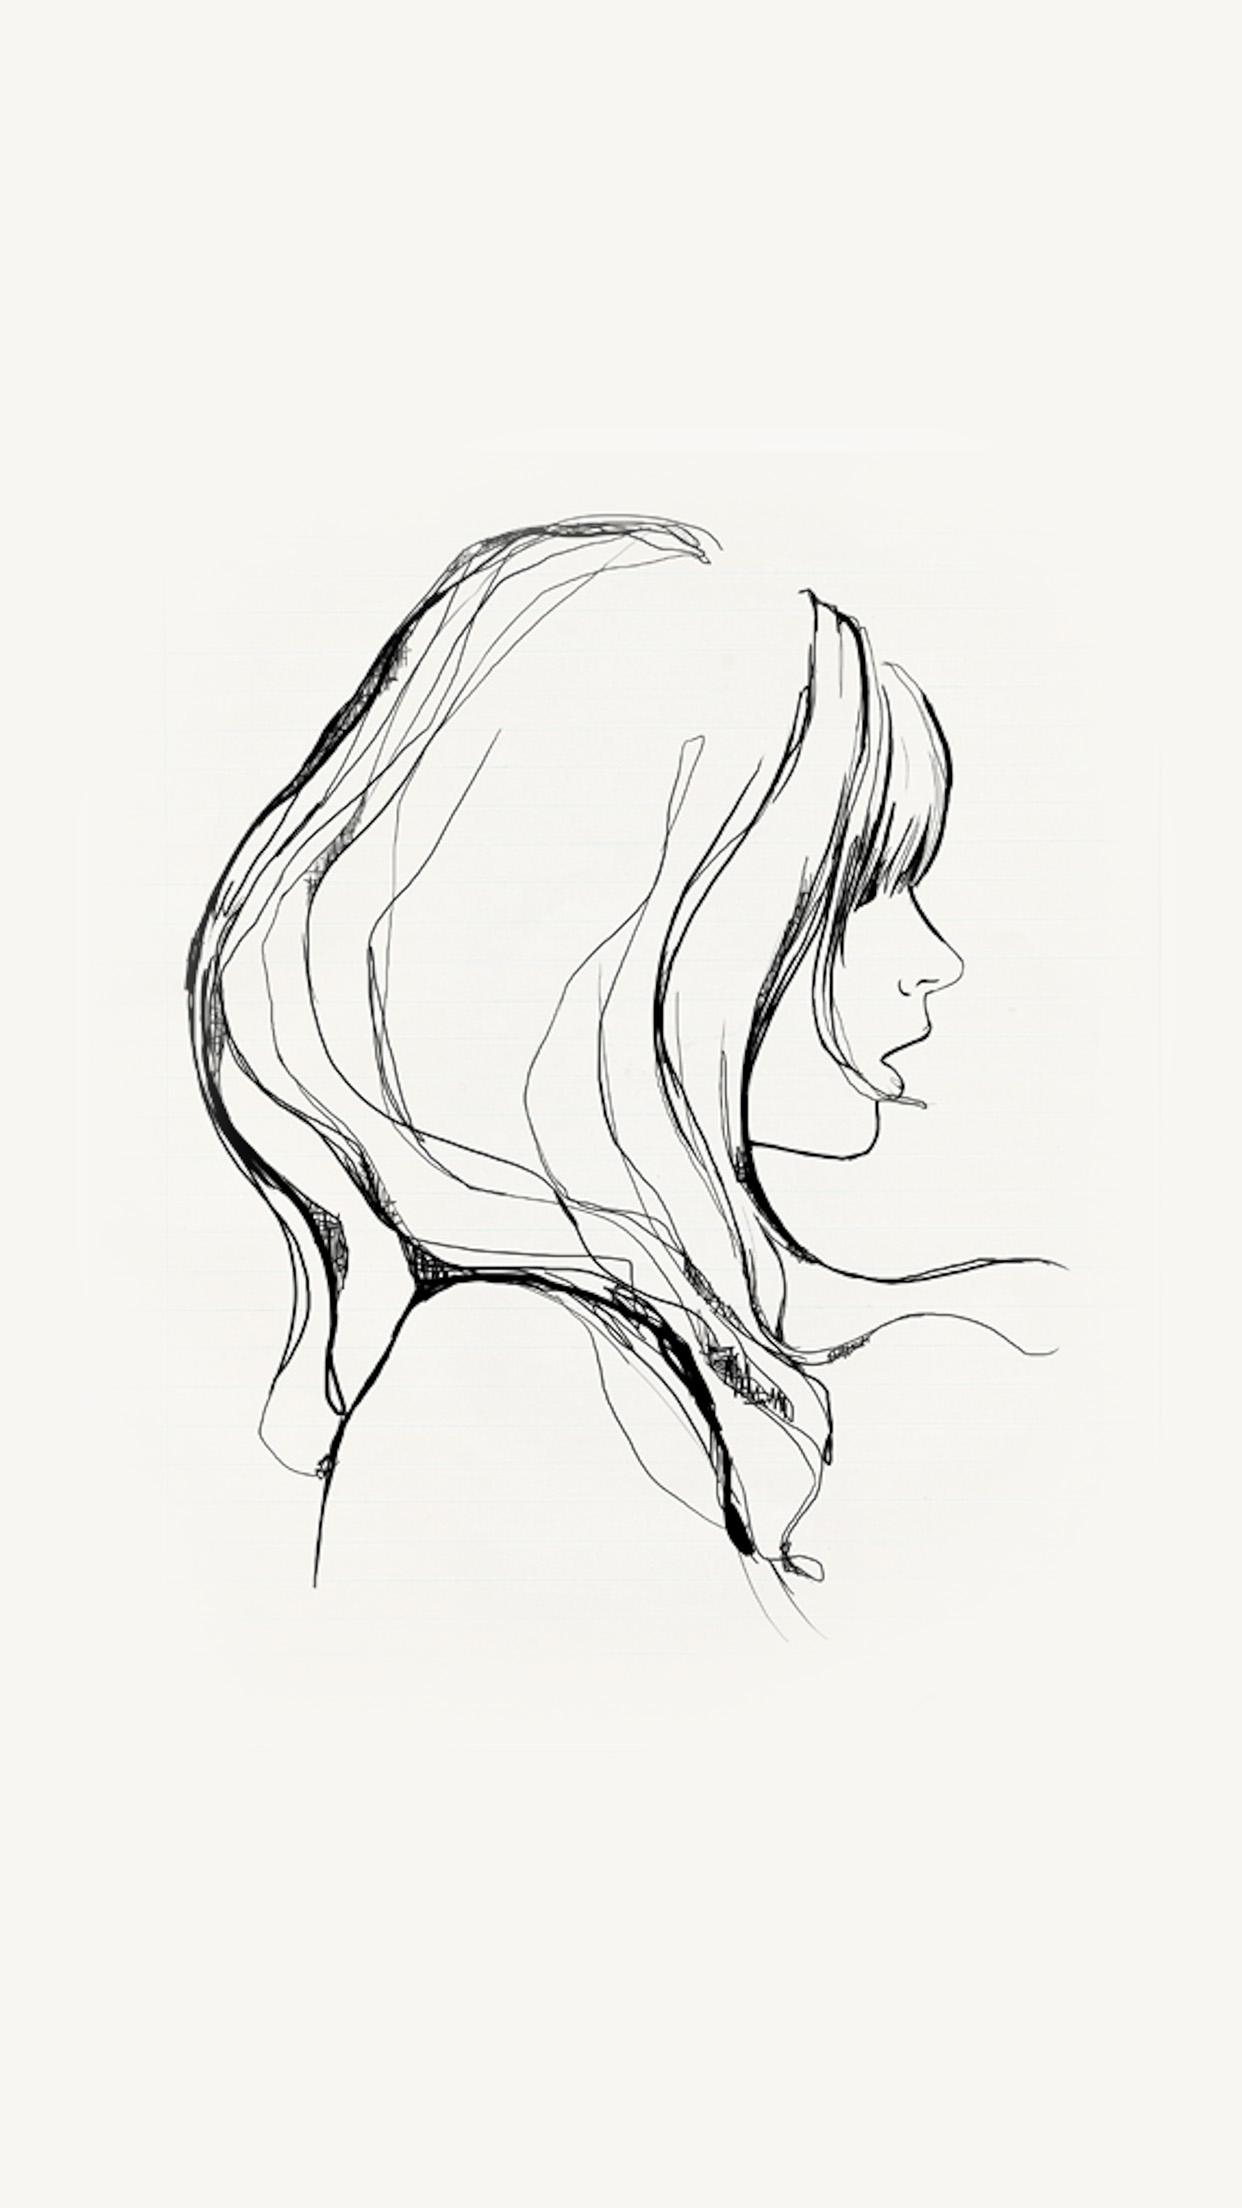 Papersco  Iphone Wallpaper  Az87-Drawing-Simple-Minimal -5724